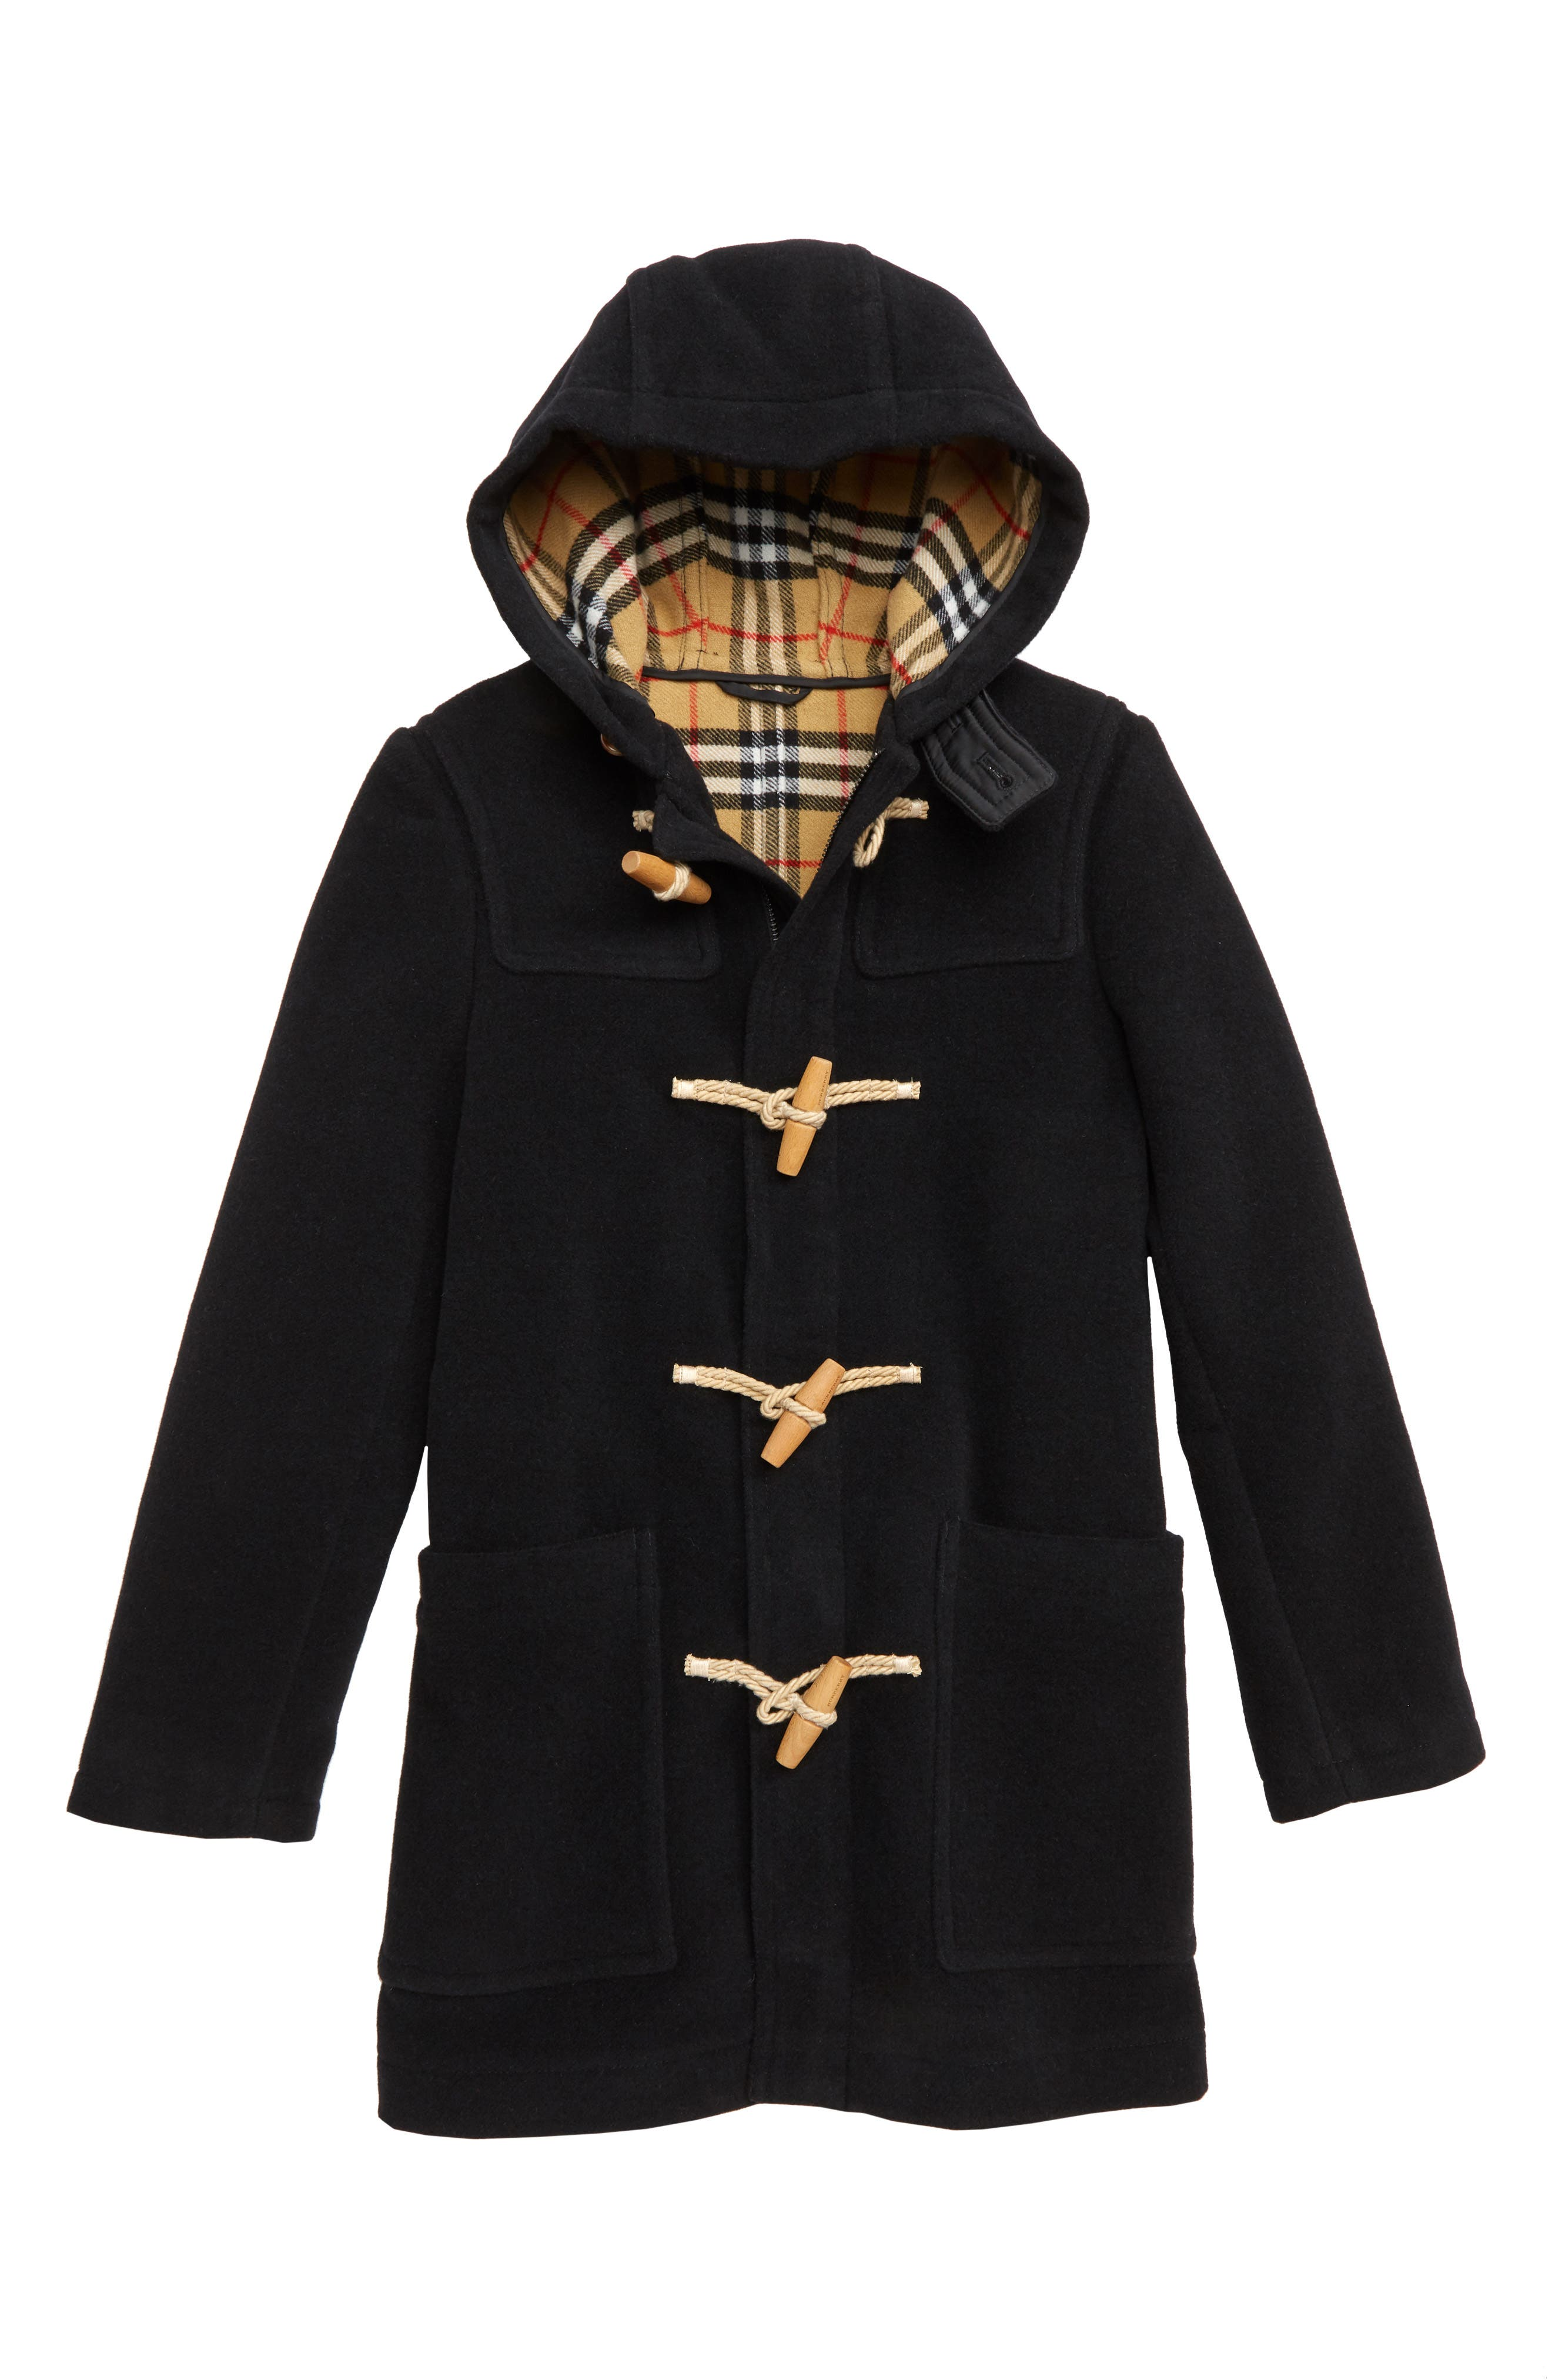 BURBERRY, Burford Double-Face Wool Duffel Coat, Main thumbnail 1, color, 001